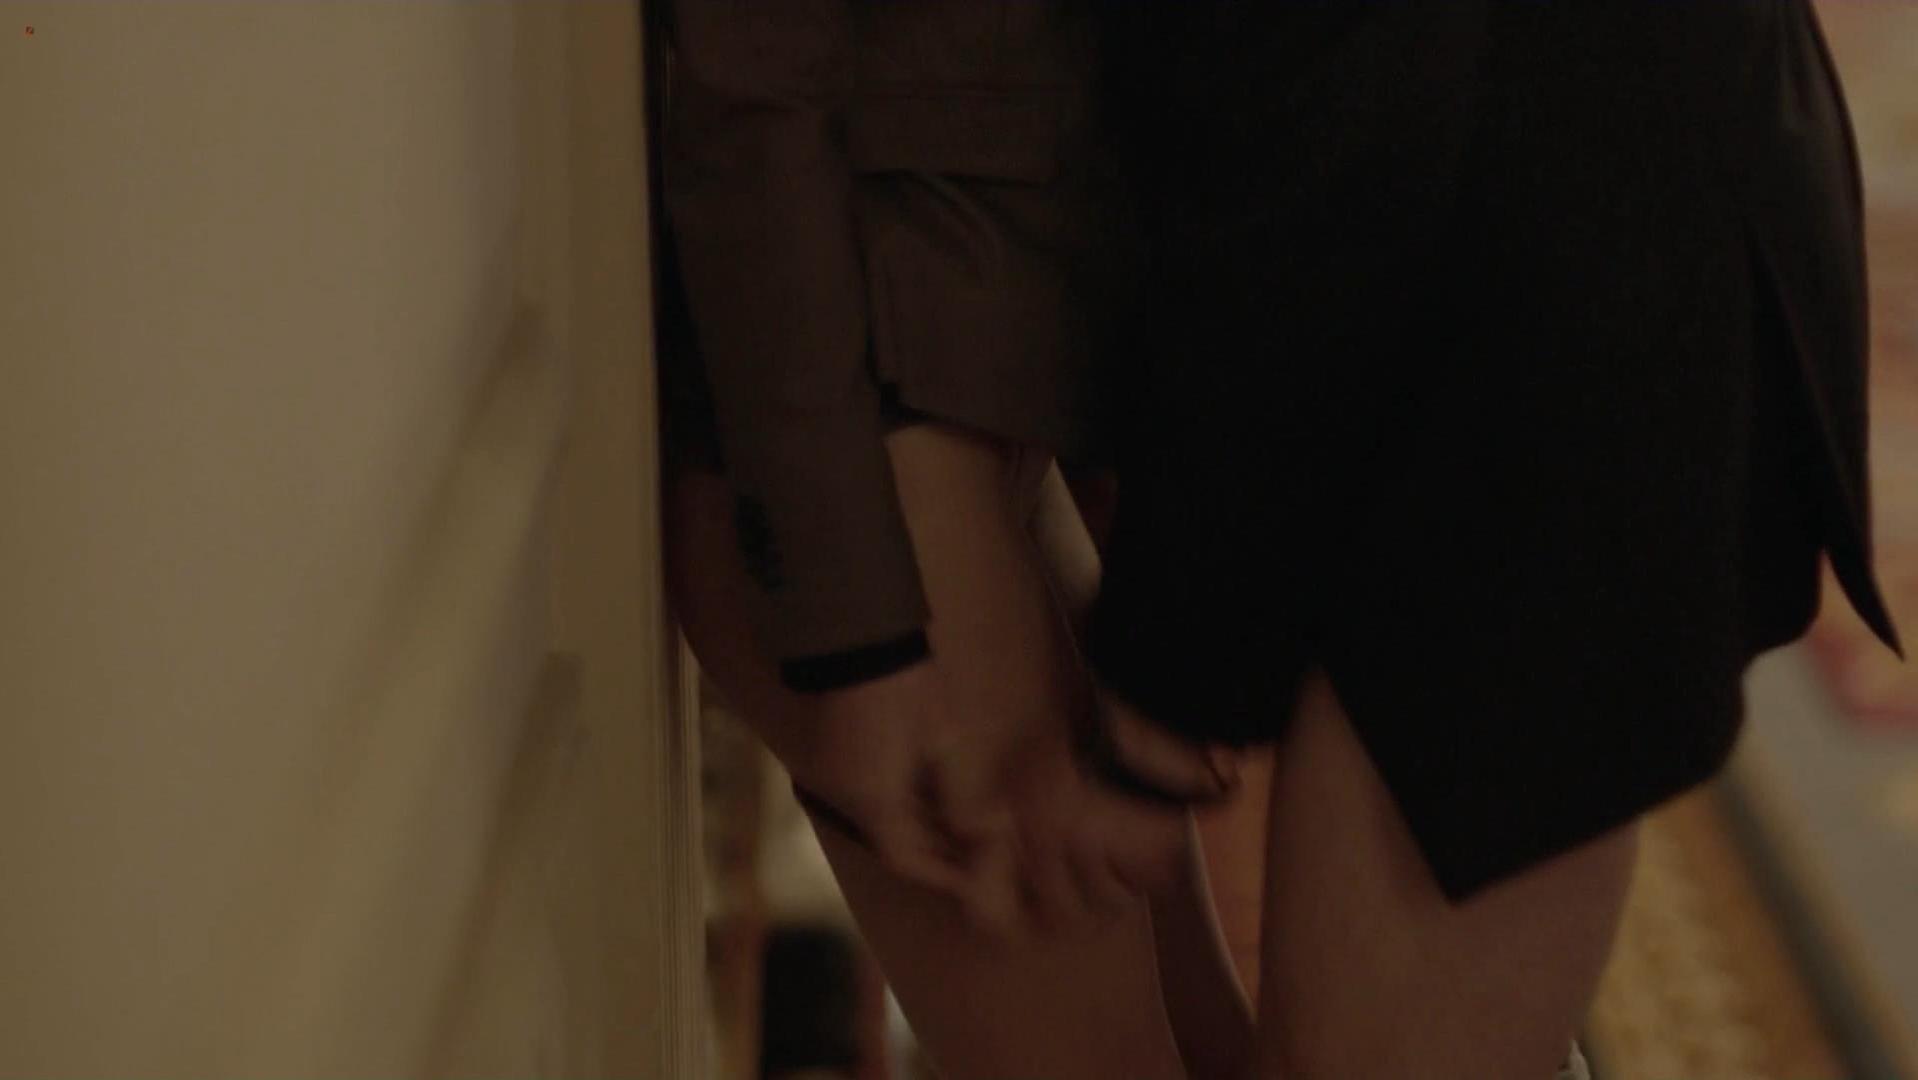 Exposing erotic panties